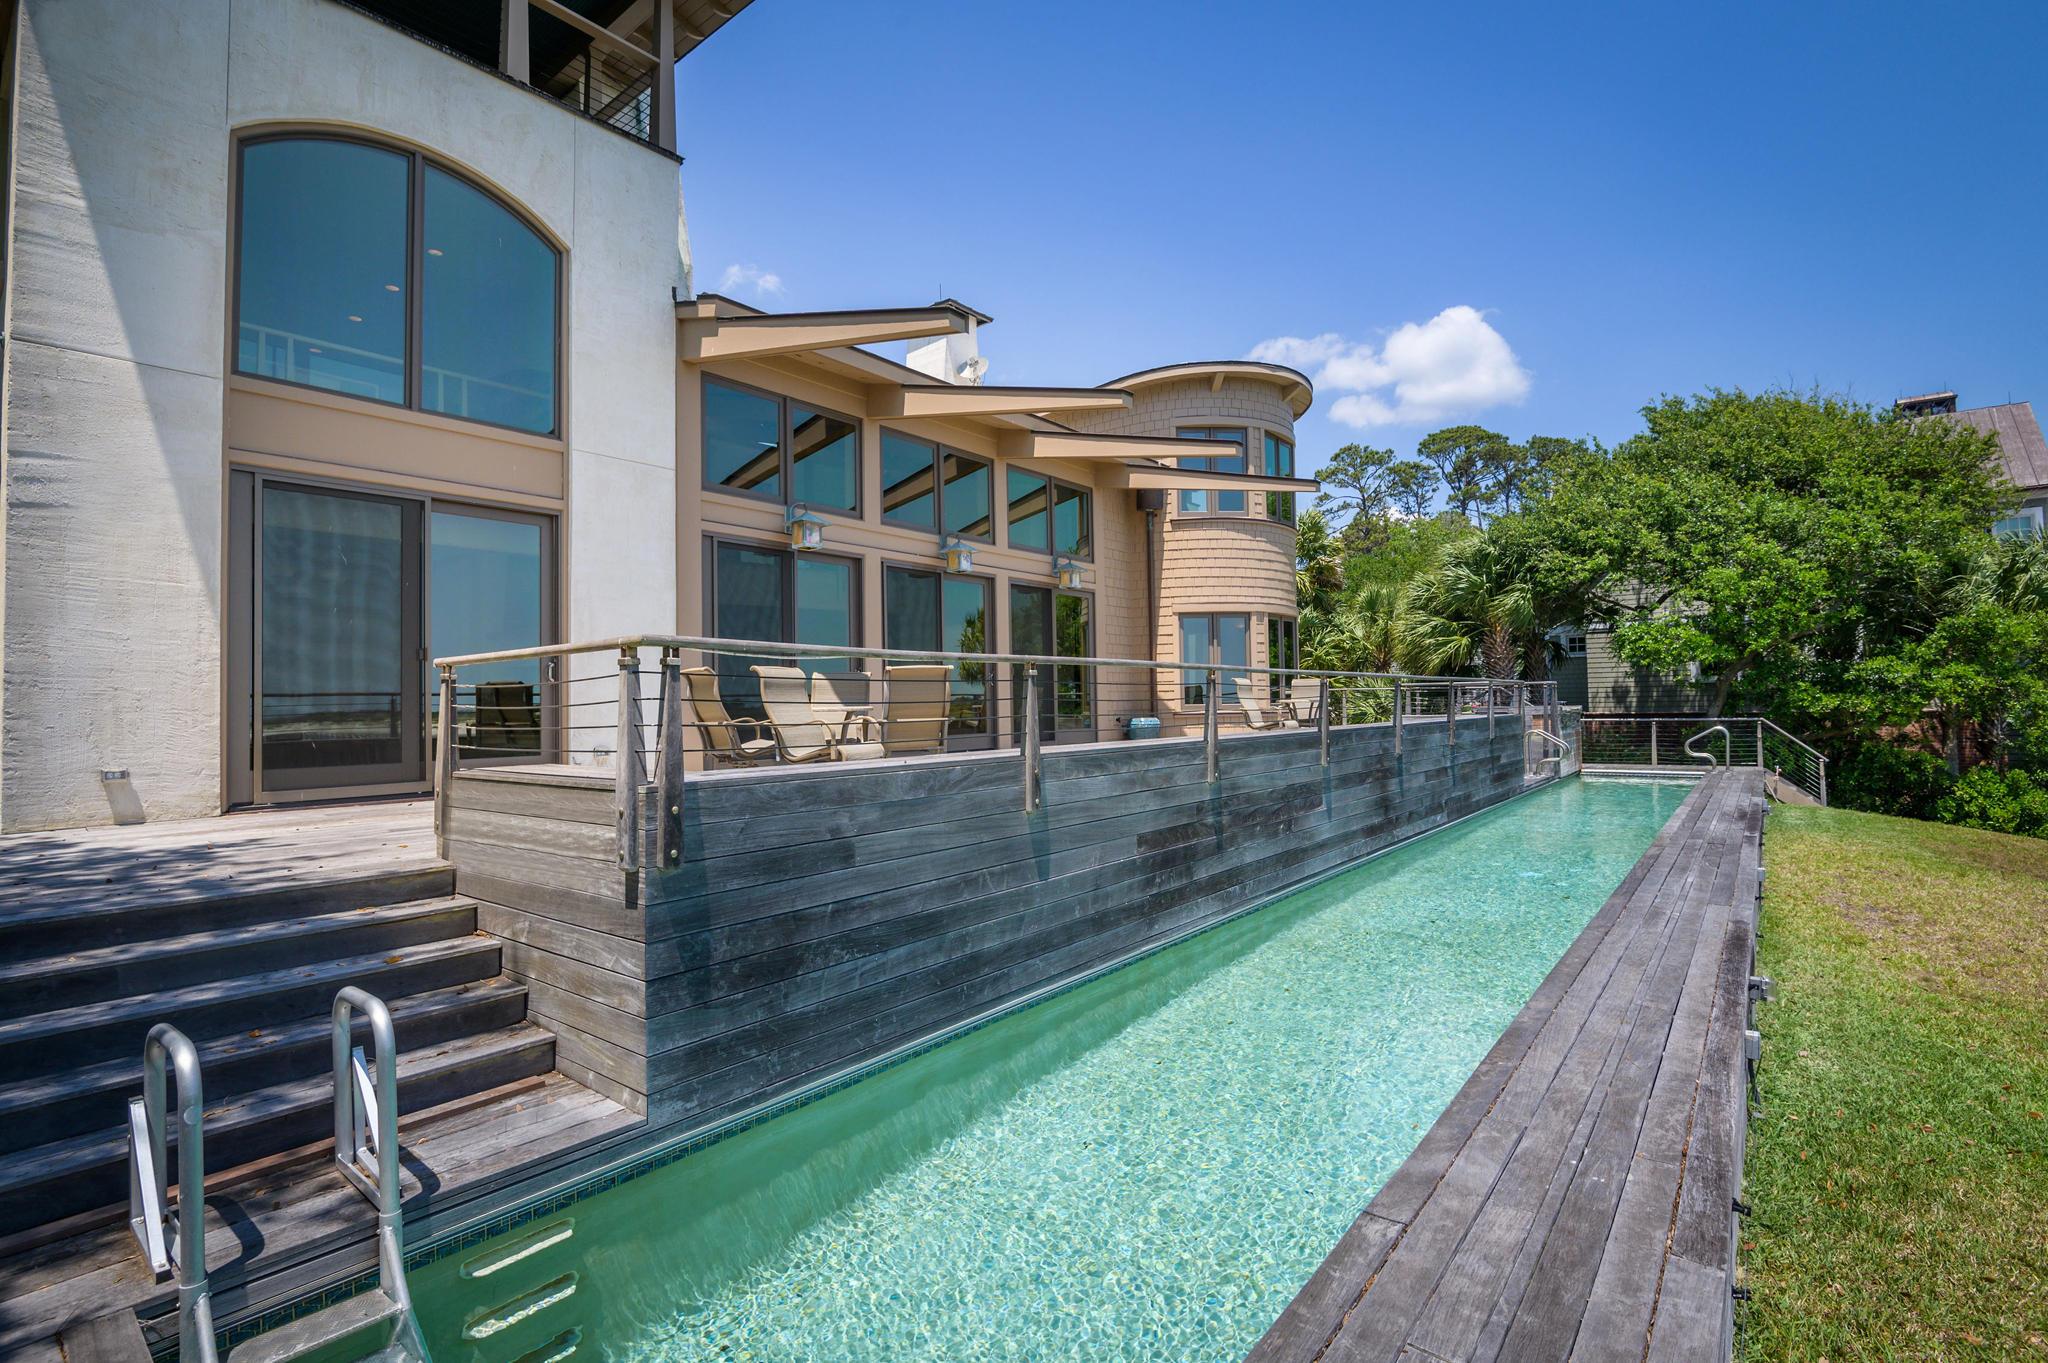 Seabrook Island Homes For Sale - 3087 Marshgate, Seabrook Island, SC - 65